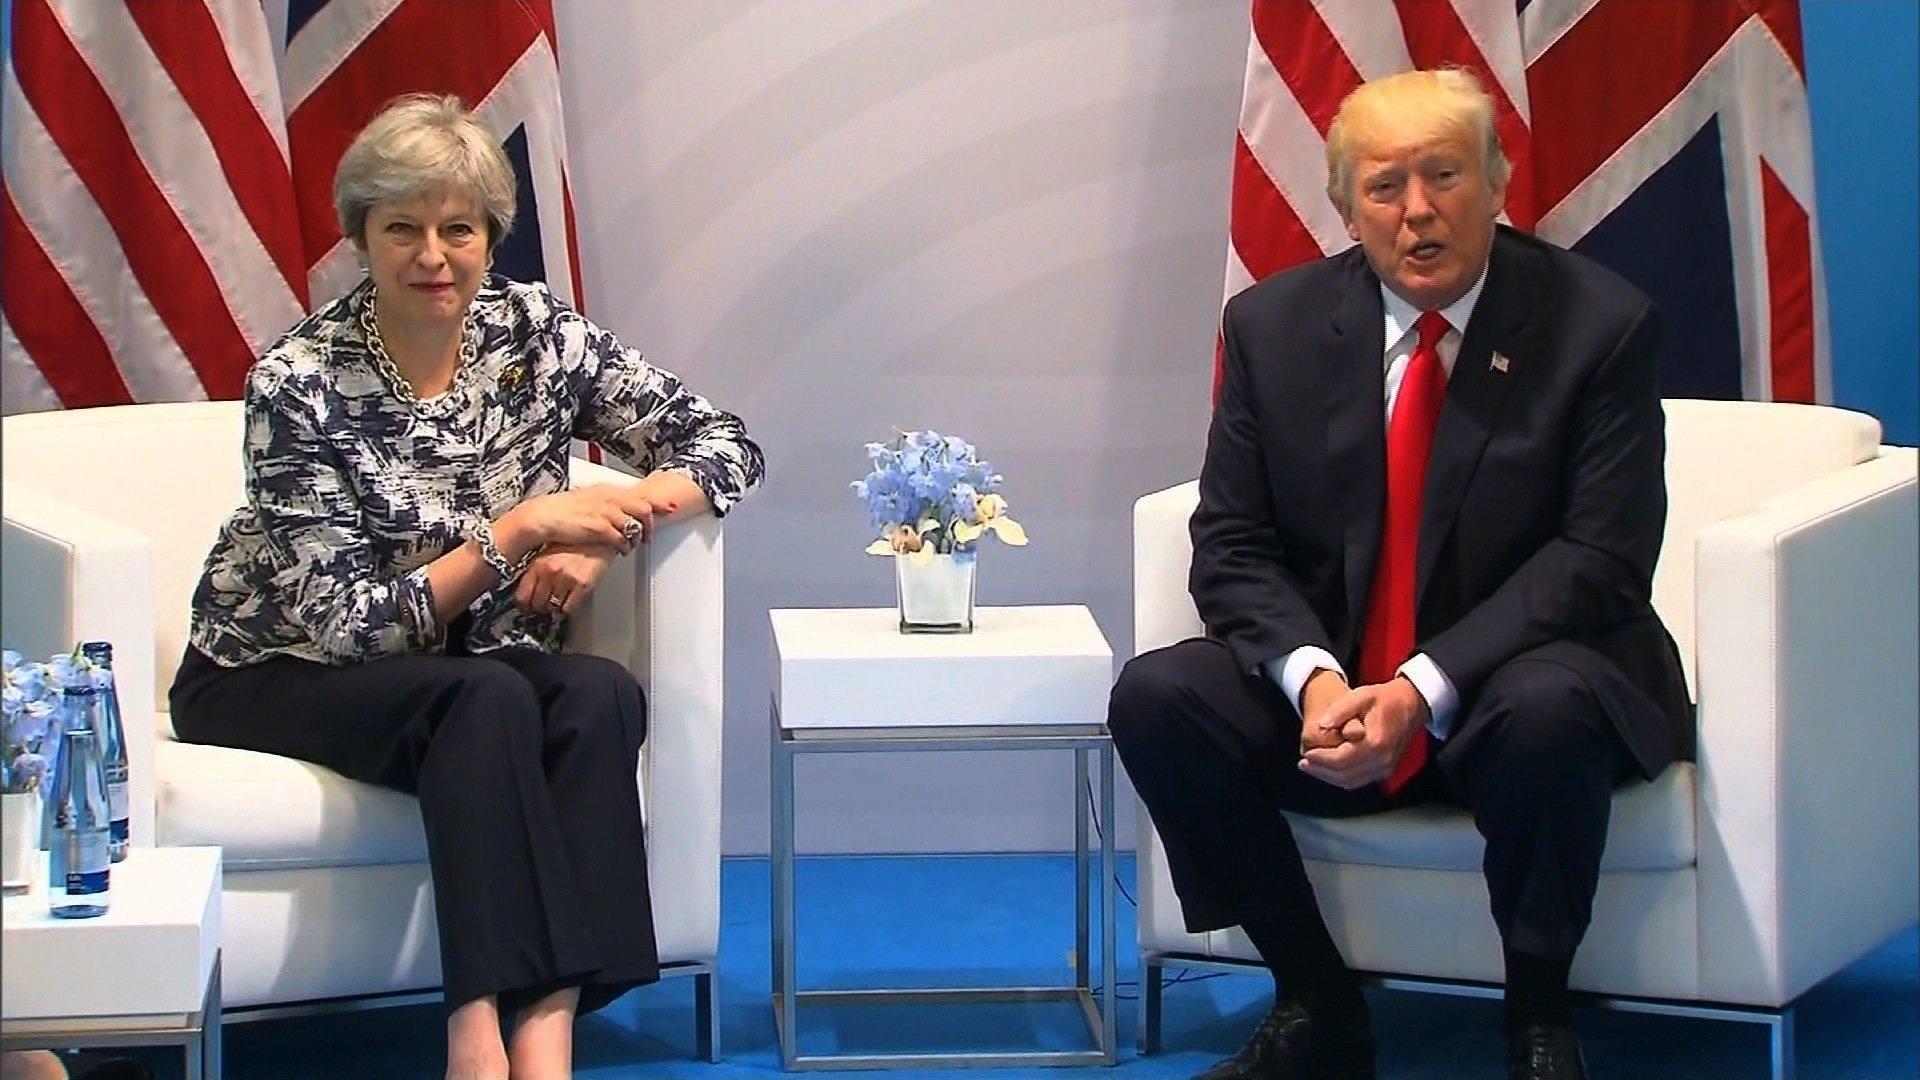 Donald Trump visit to United Kingdom postponed to next year